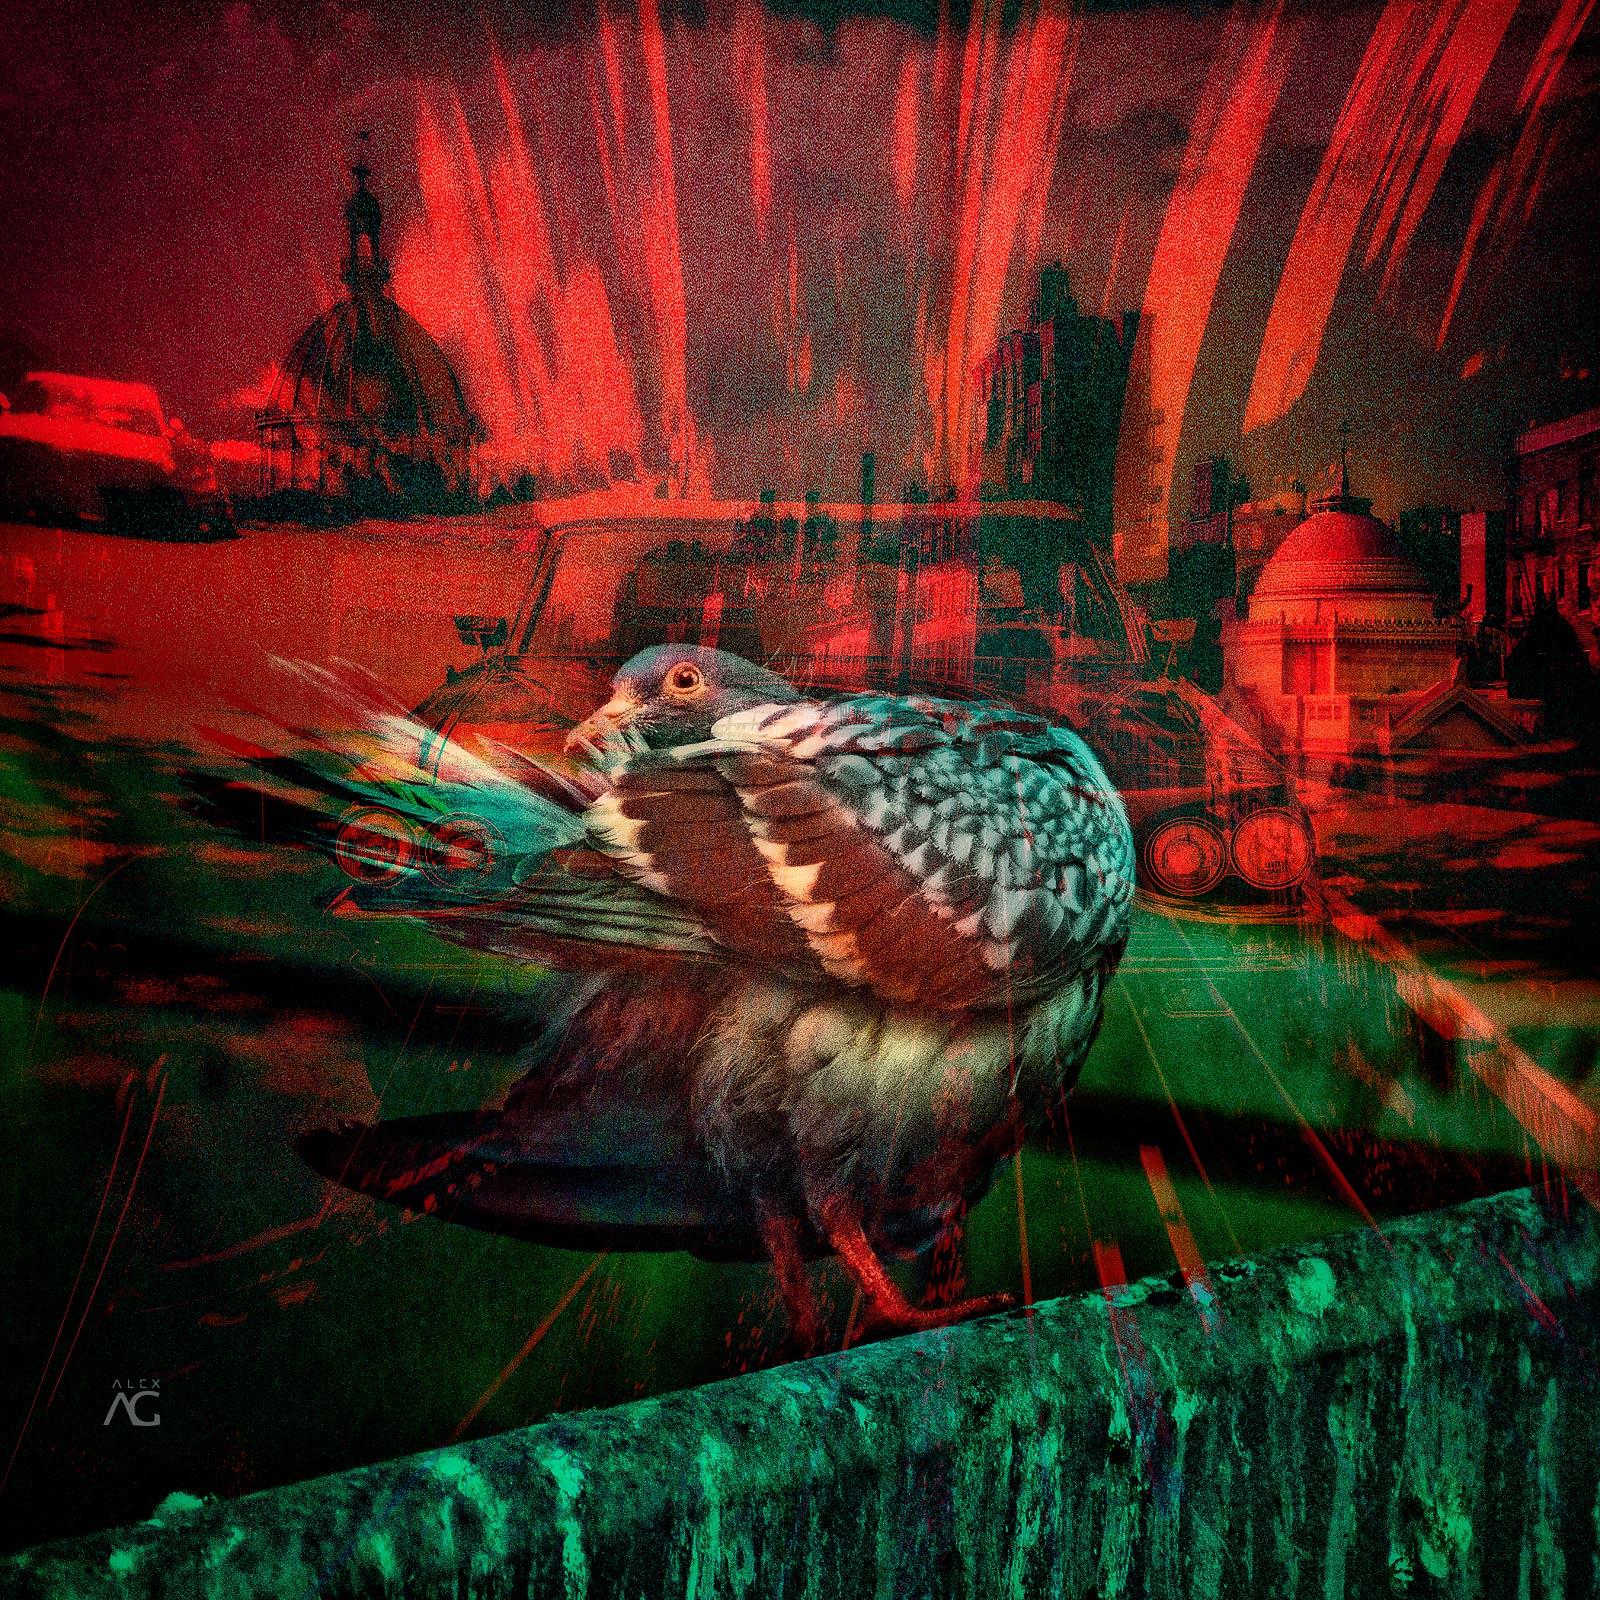 PigeonCloseupBentSingleShot_MG_3047_cannelsMixed